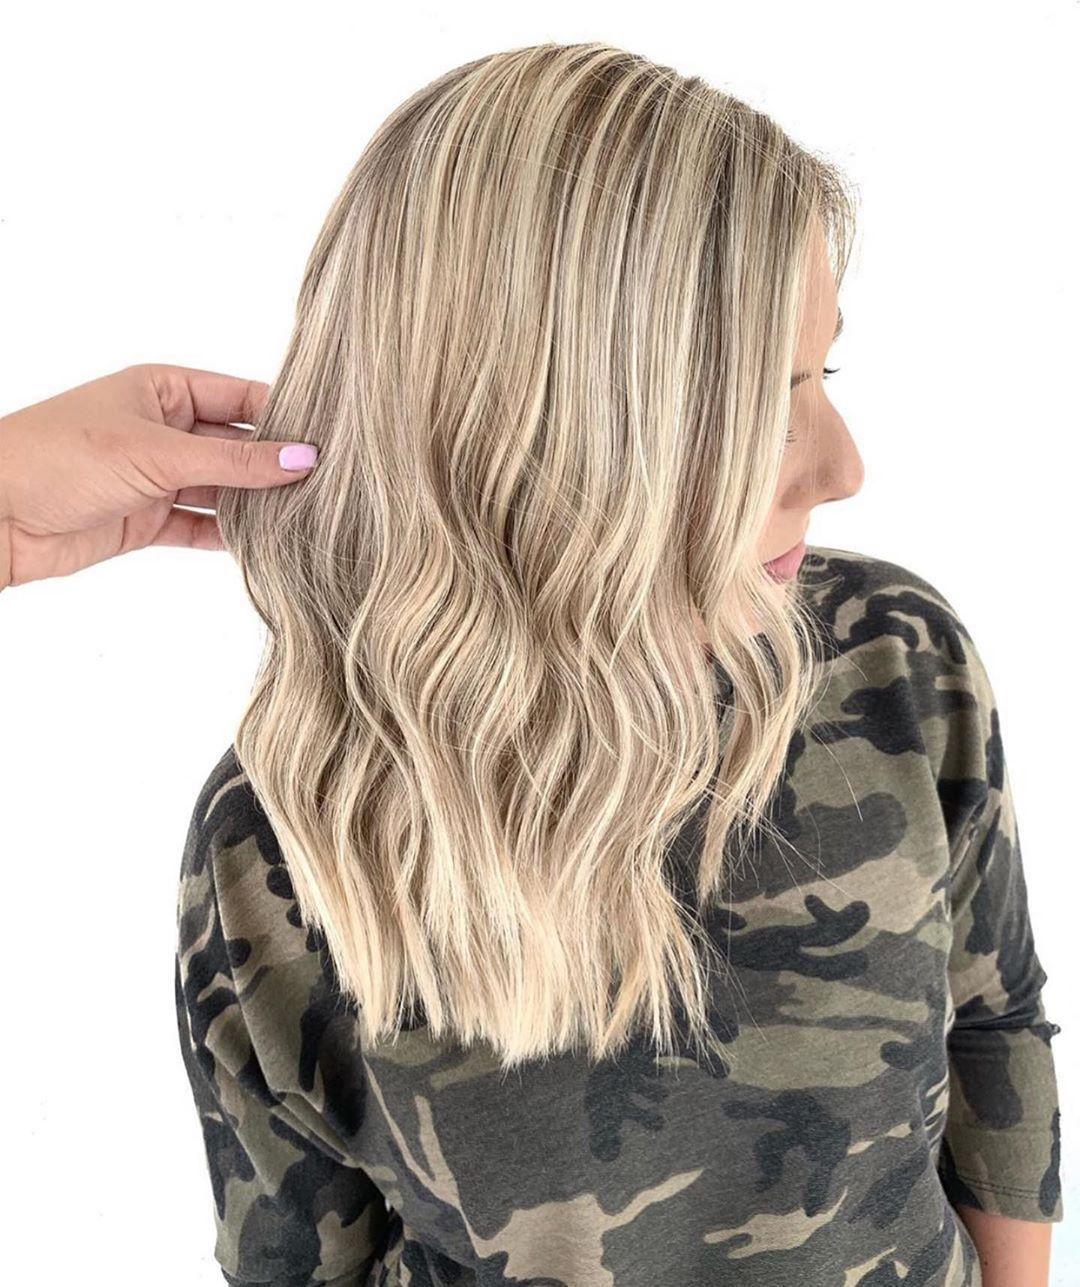 Short Hair Styling Tools Hair Tutorials Easy Best 2020